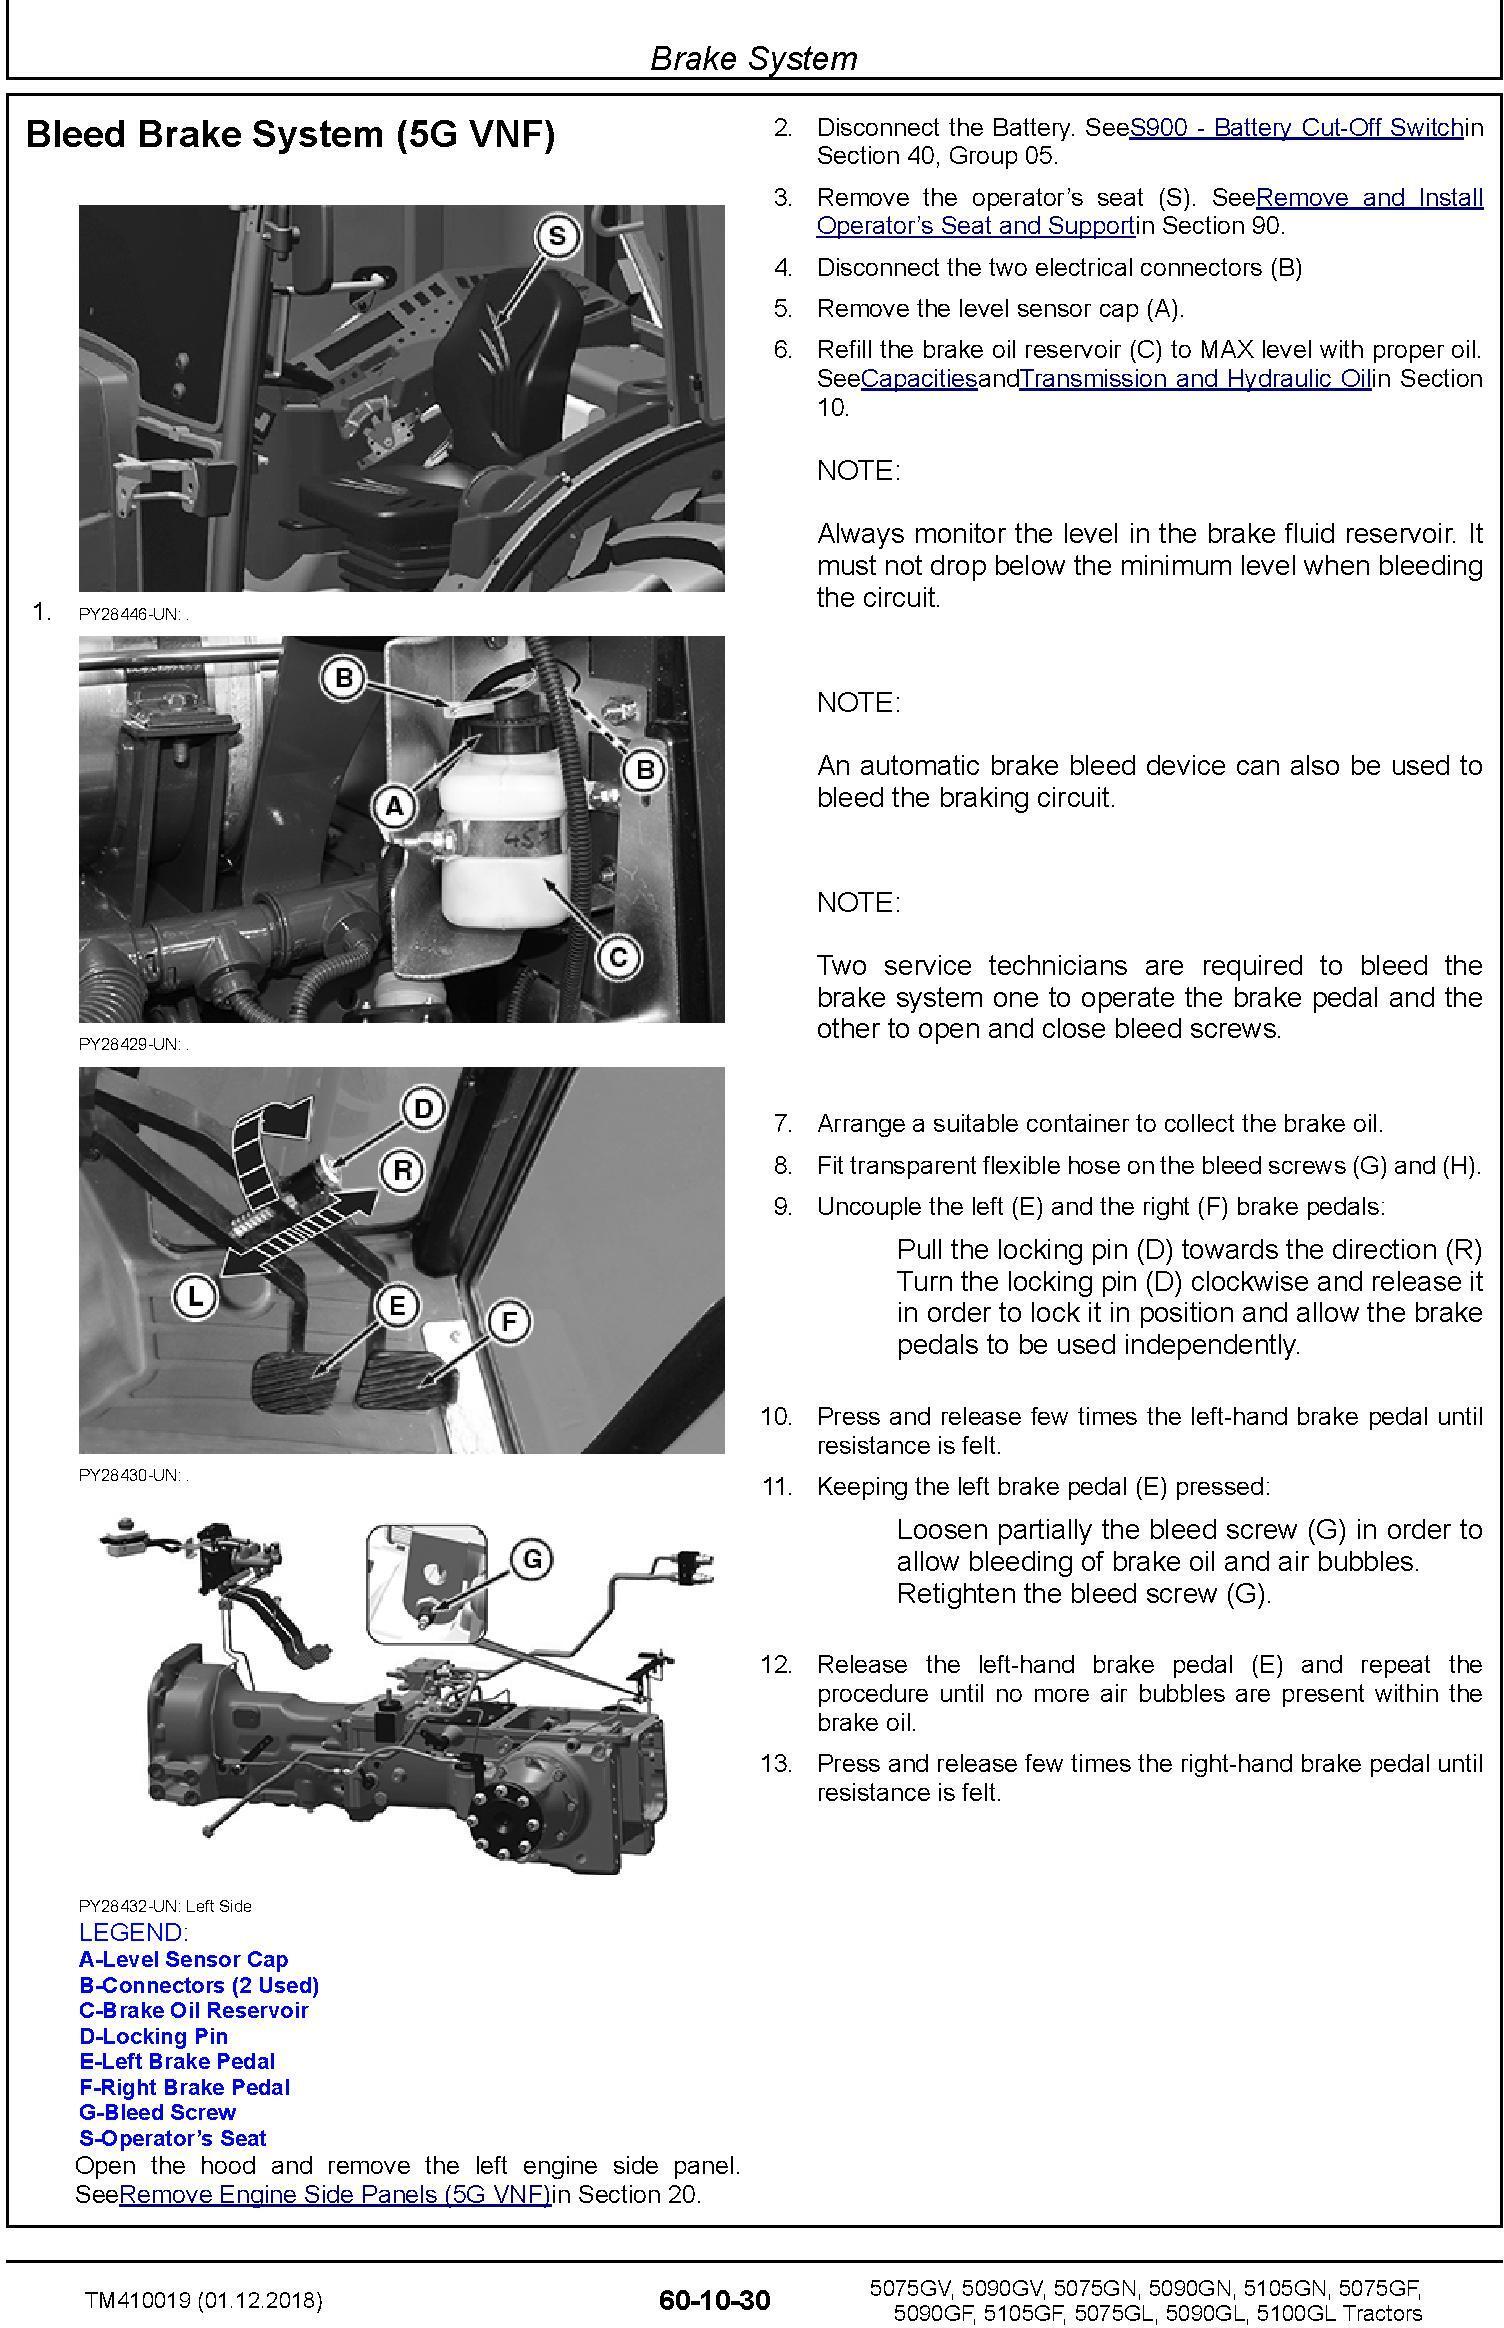 John Deere 5075GF/L/N/V, 5090GF/L/N/V, 5100GL, 5105GF/N Tractors Repair Technical Manual (TM410019) - 2